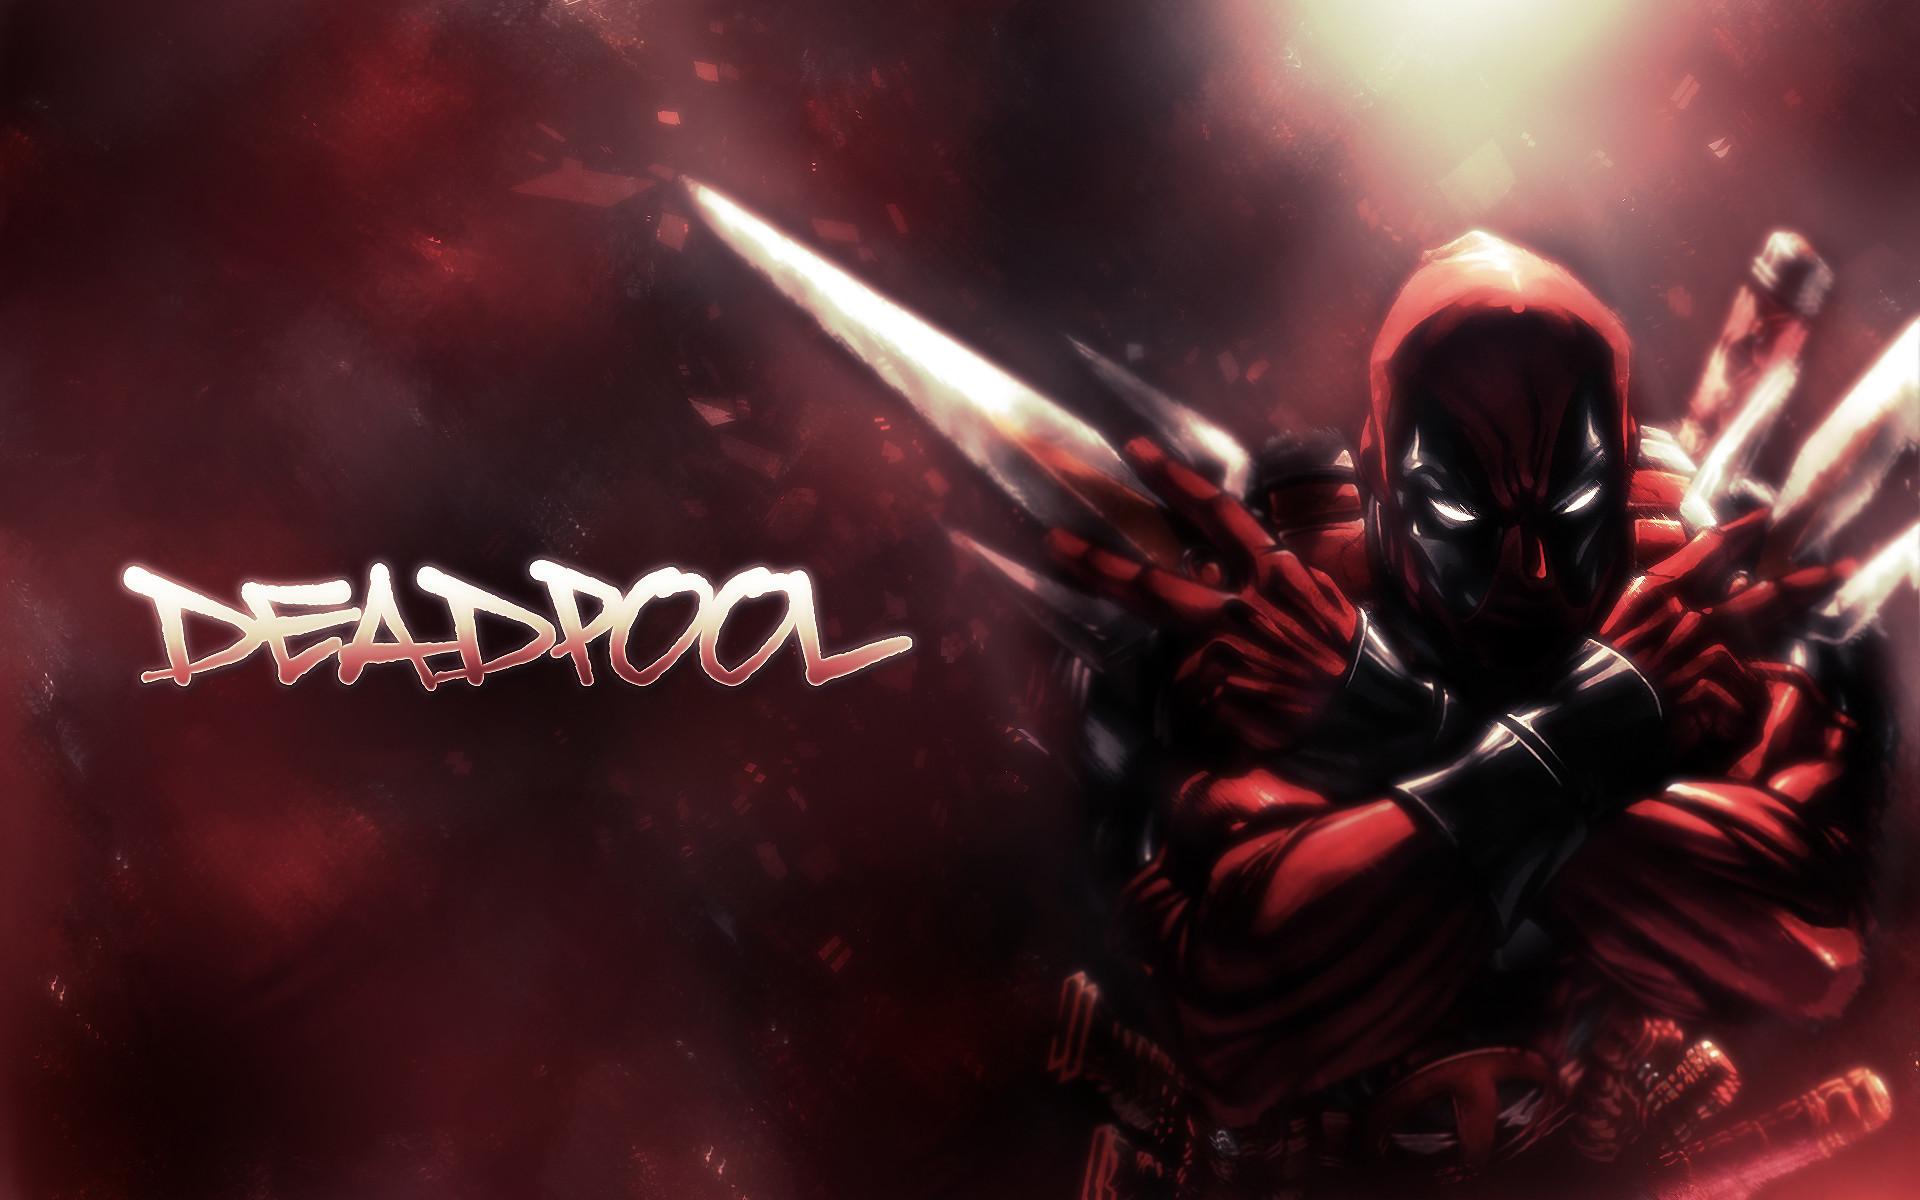 deadpool wallpaper hd backgrounds images, Cyan Mason 2017-03-07 |  ololoshenka | Pinterest | Deadpool free, Deadpool and Hd backgrounds